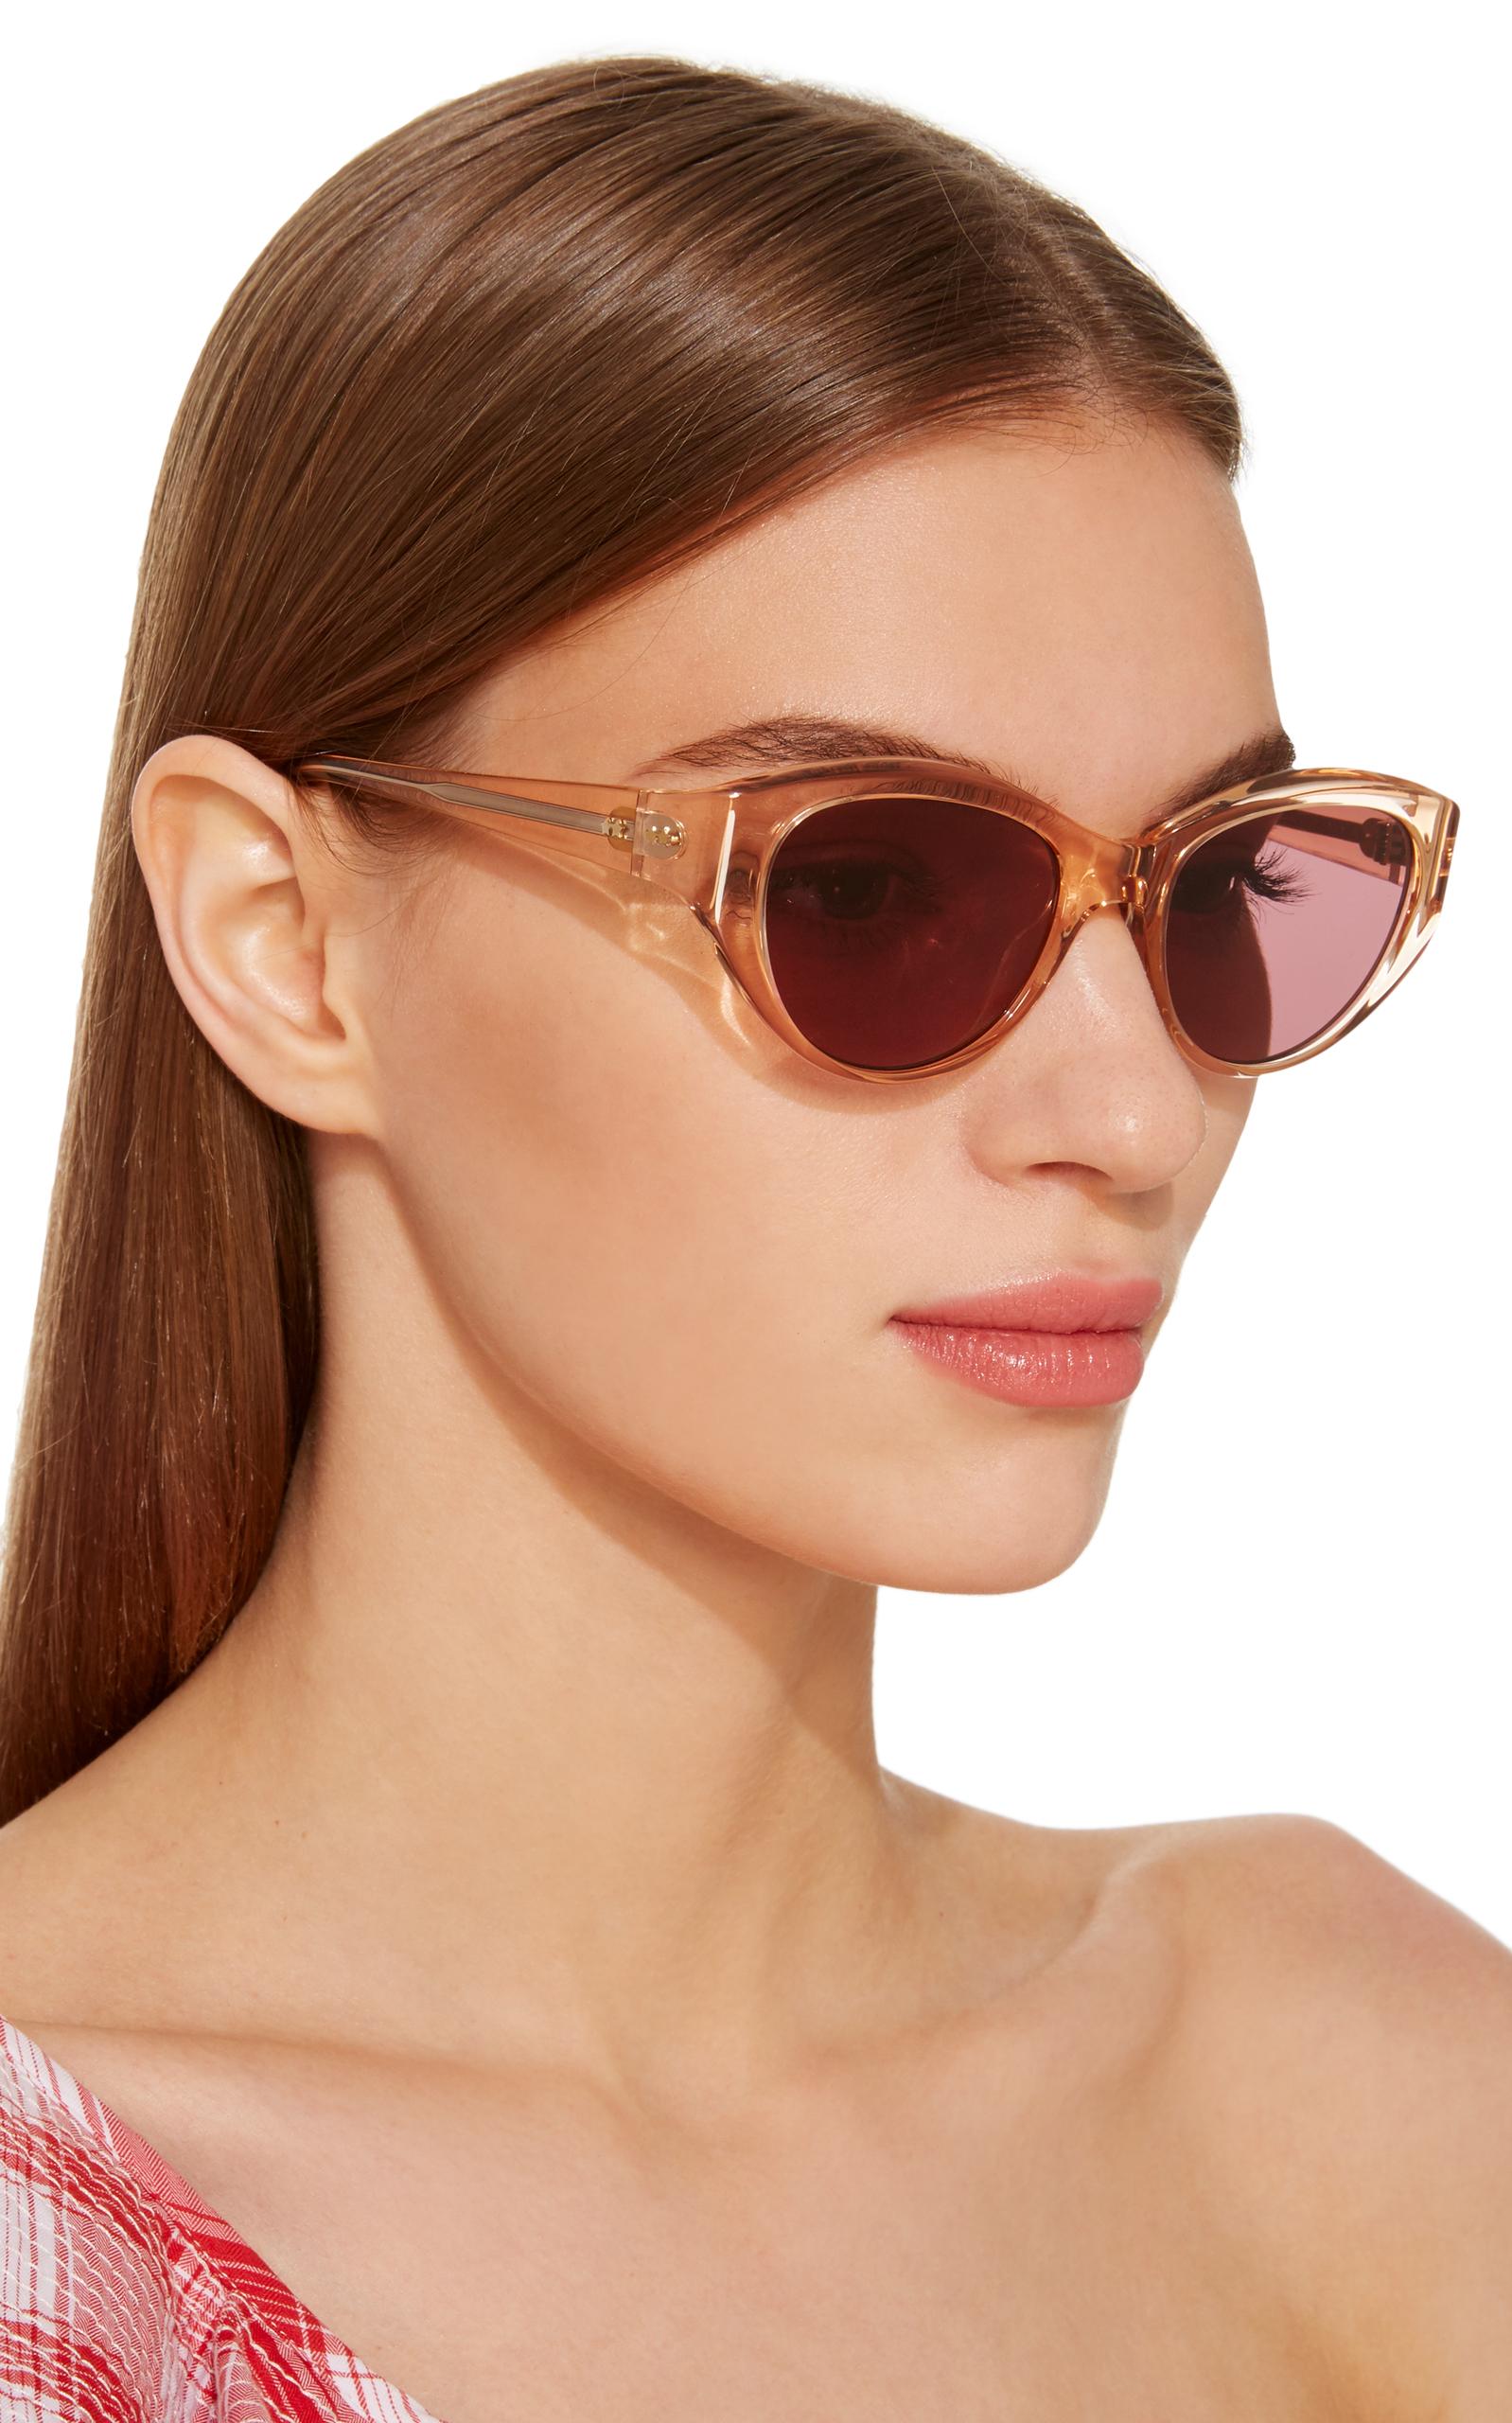 Del Rey sunglasses - Black Garrett Leight dDCJx